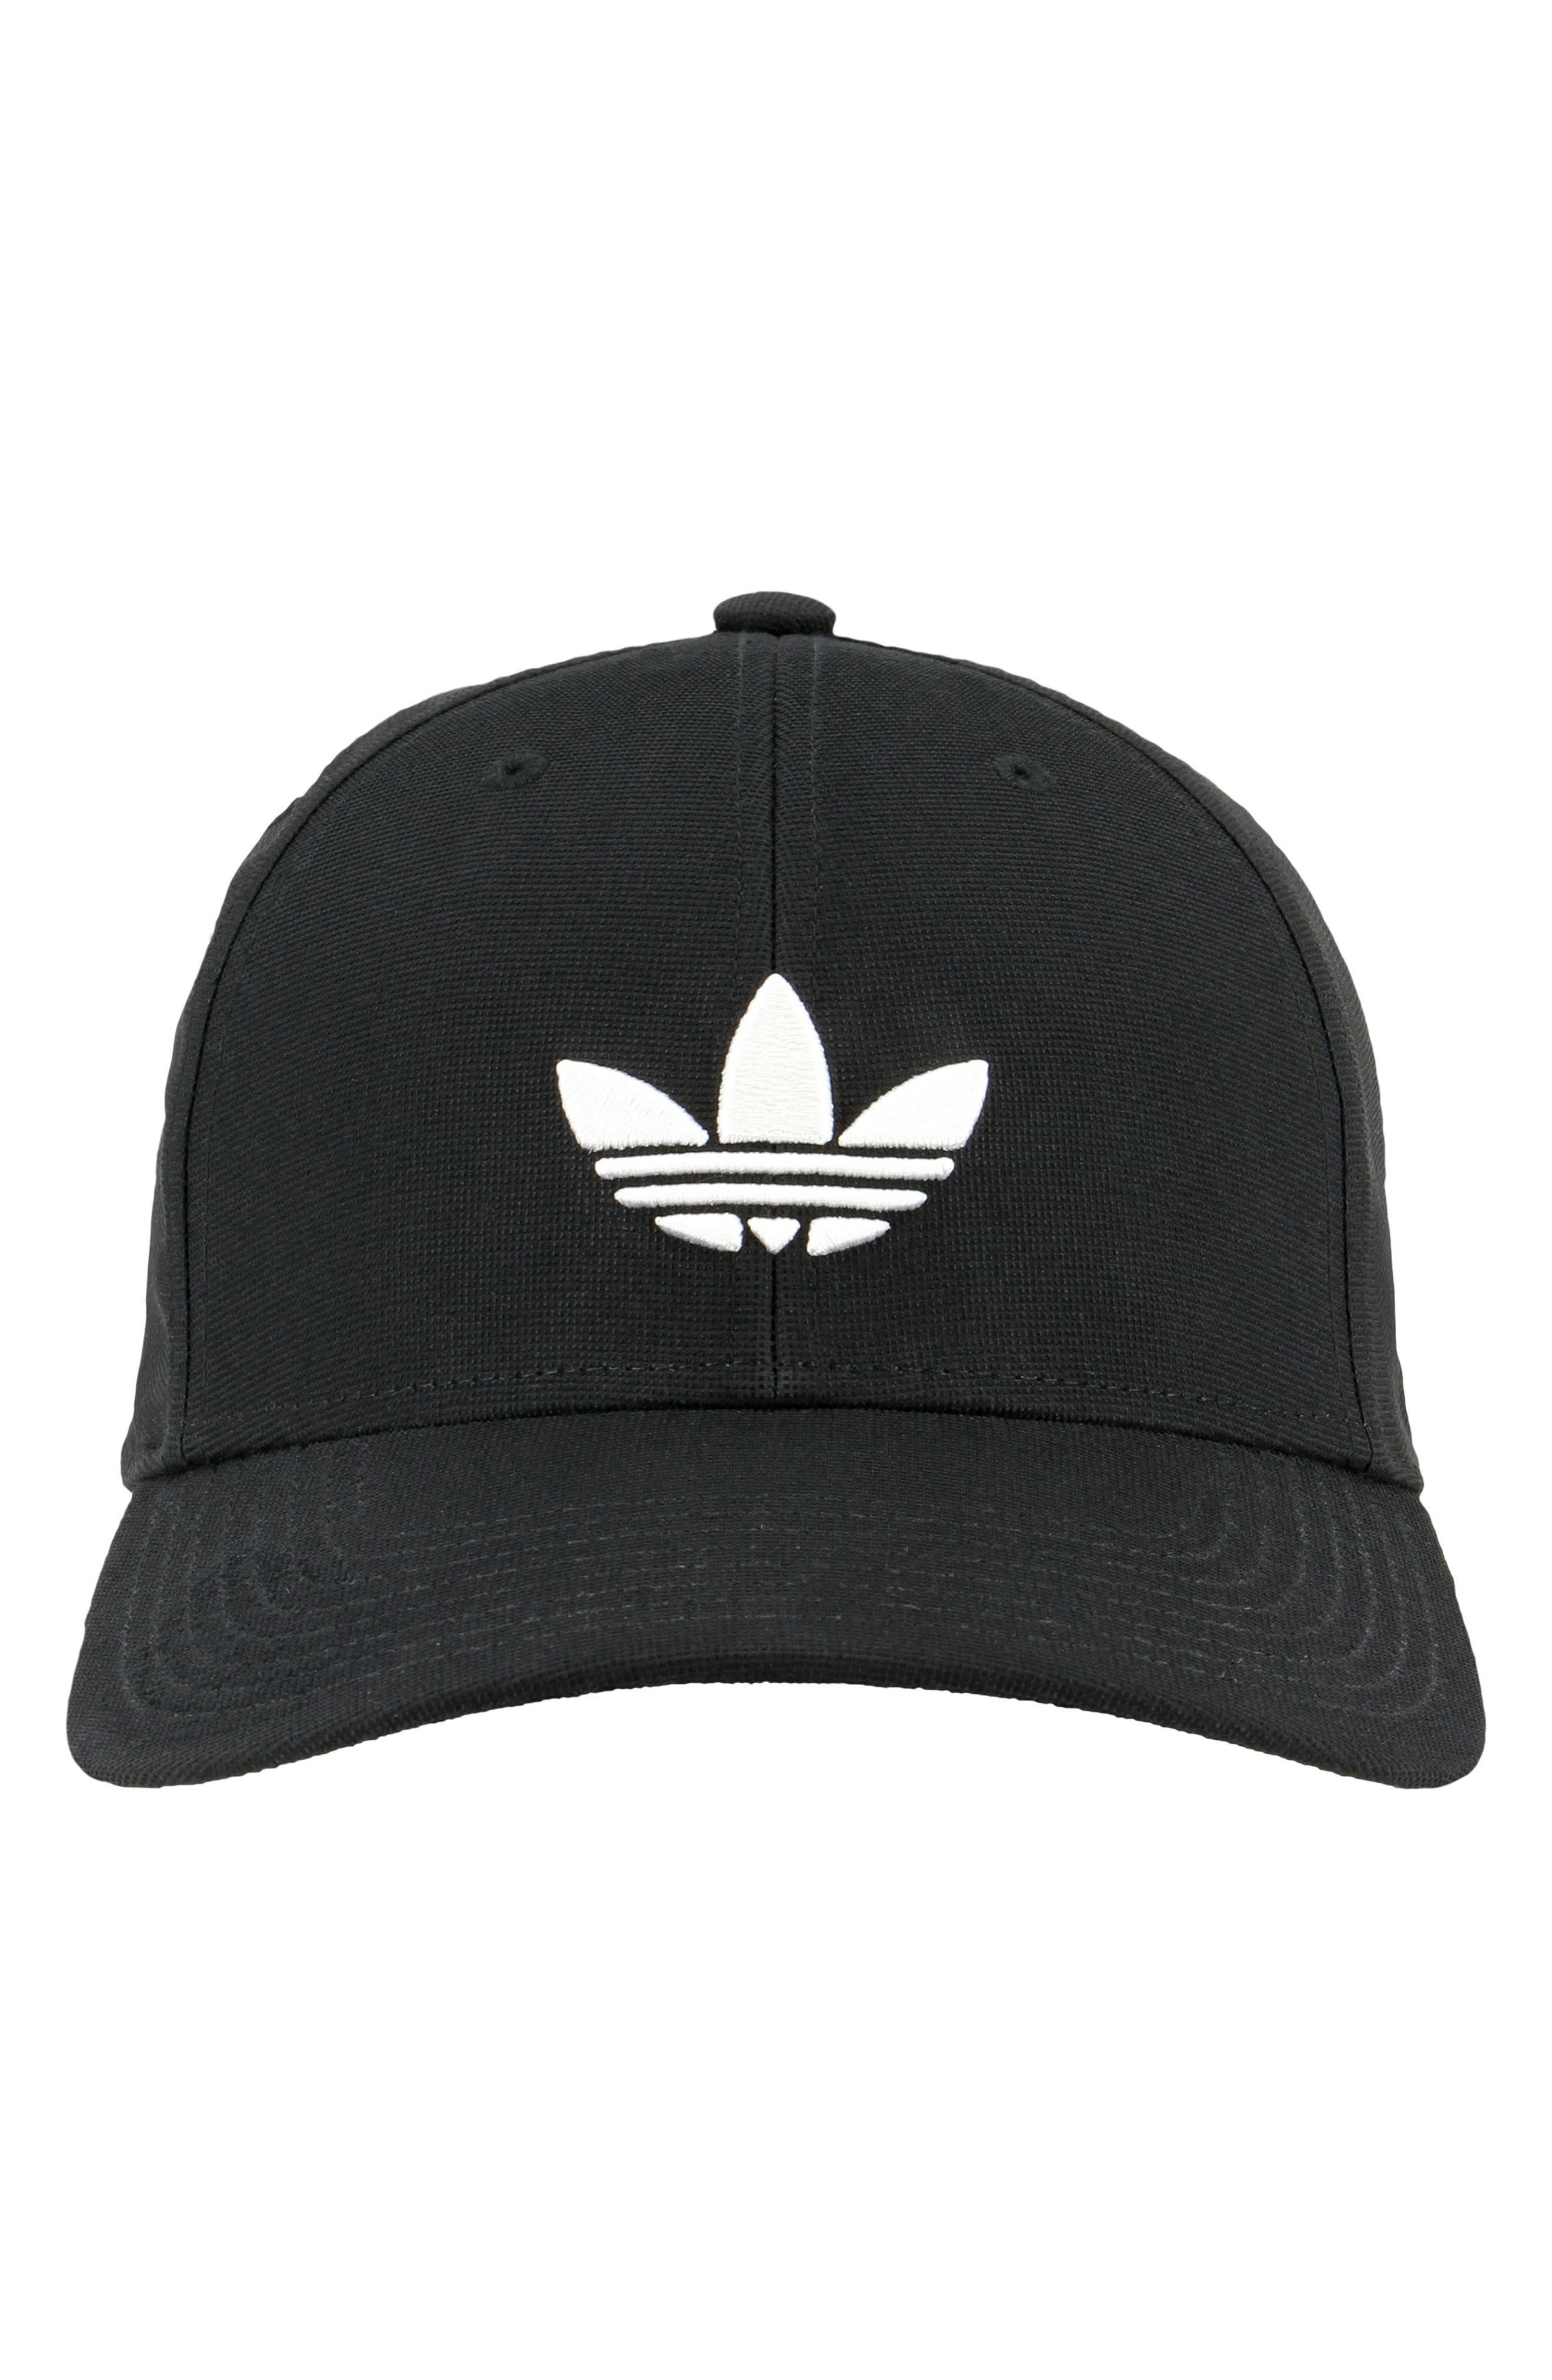 Trefoil Stretch Ball Cap,                             Alternate thumbnail 4, color,                             Black/ White